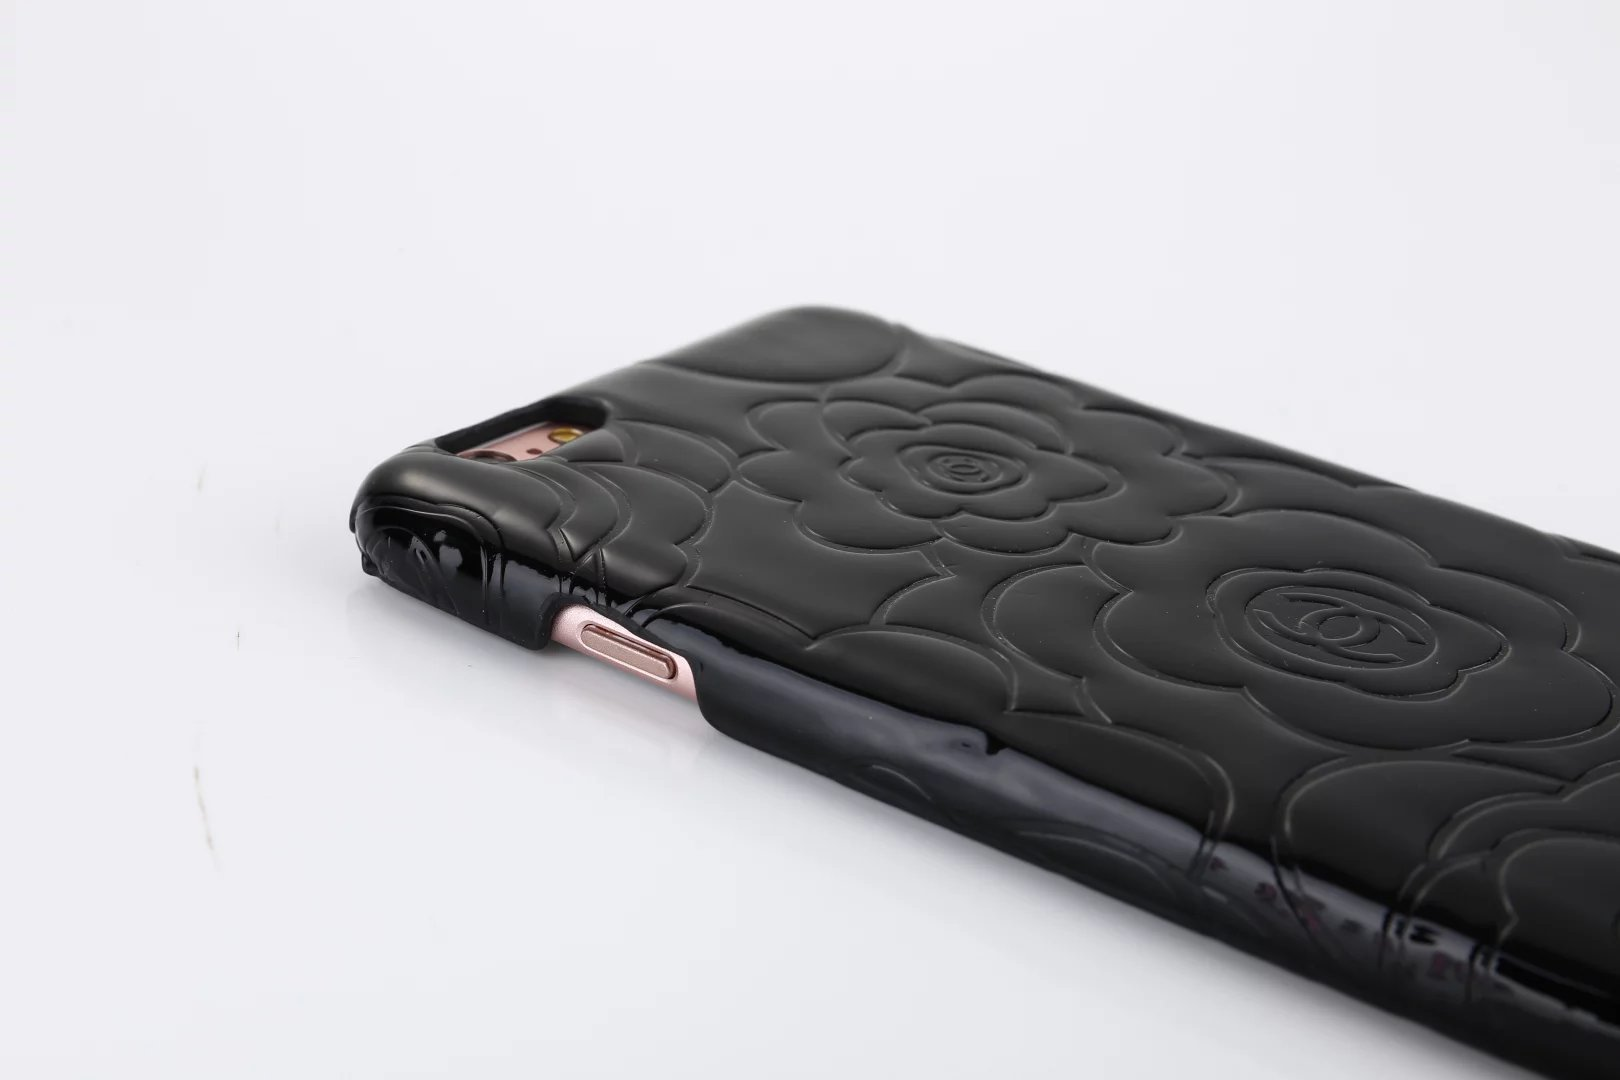 iphone hüllen günstig die besten iphone hüllen Chanel iphone7 hülle iphone 7 hülle gold personalisierte smartphone hülle handy gestalten größe handyhülle leder iphone 7 beste hülle für iphone 7